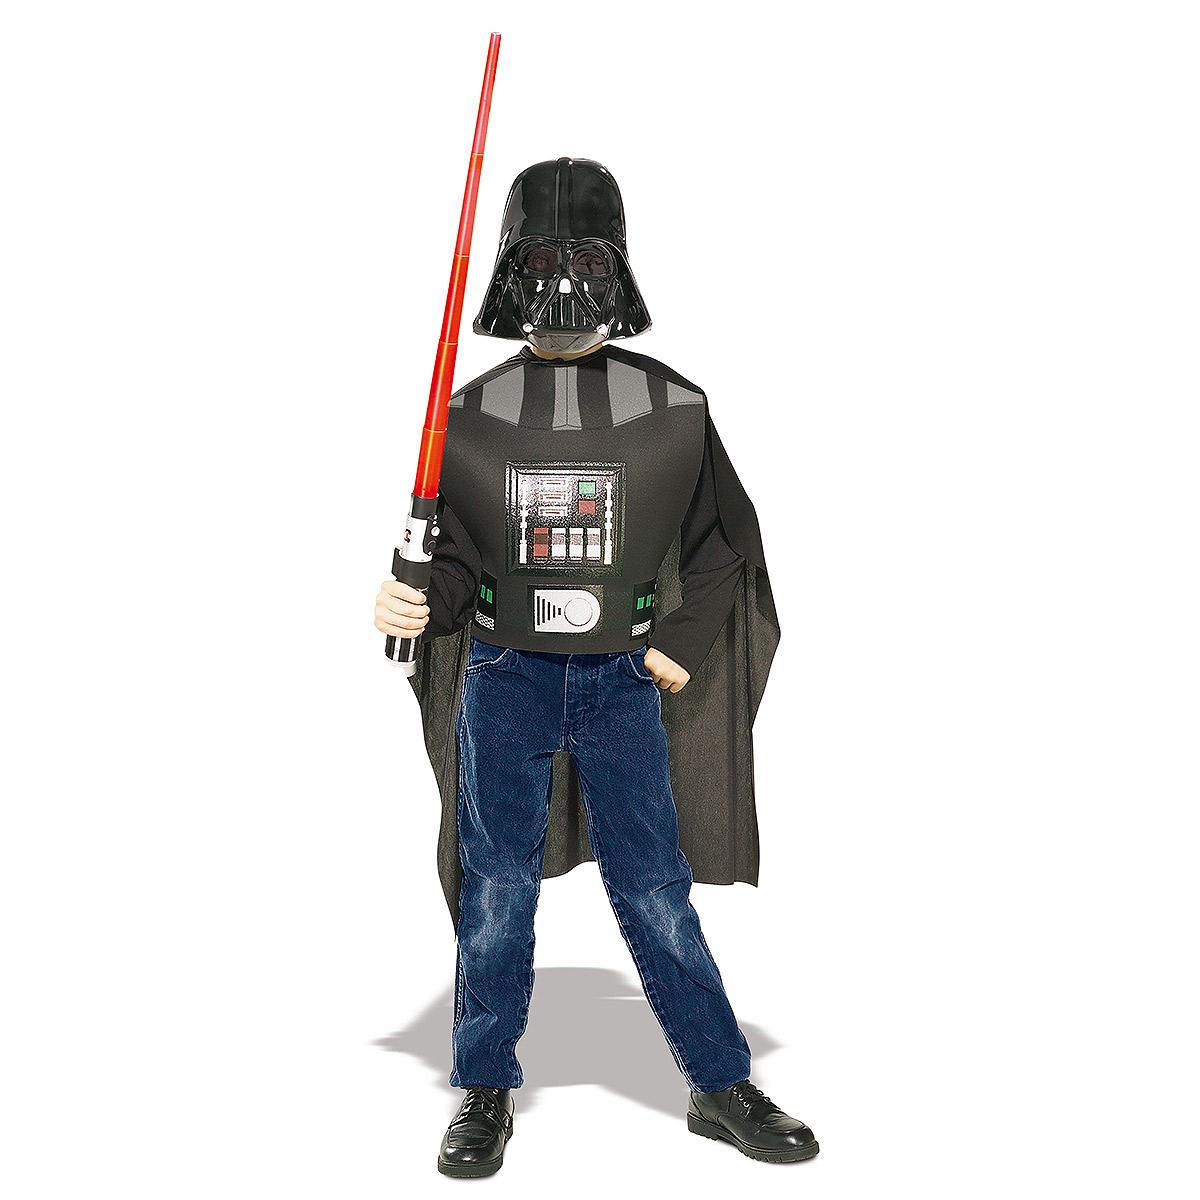 original darth vader kost m cape maske lichtschwert star wars kost m 128 140 ebay. Black Bedroom Furniture Sets. Home Design Ideas